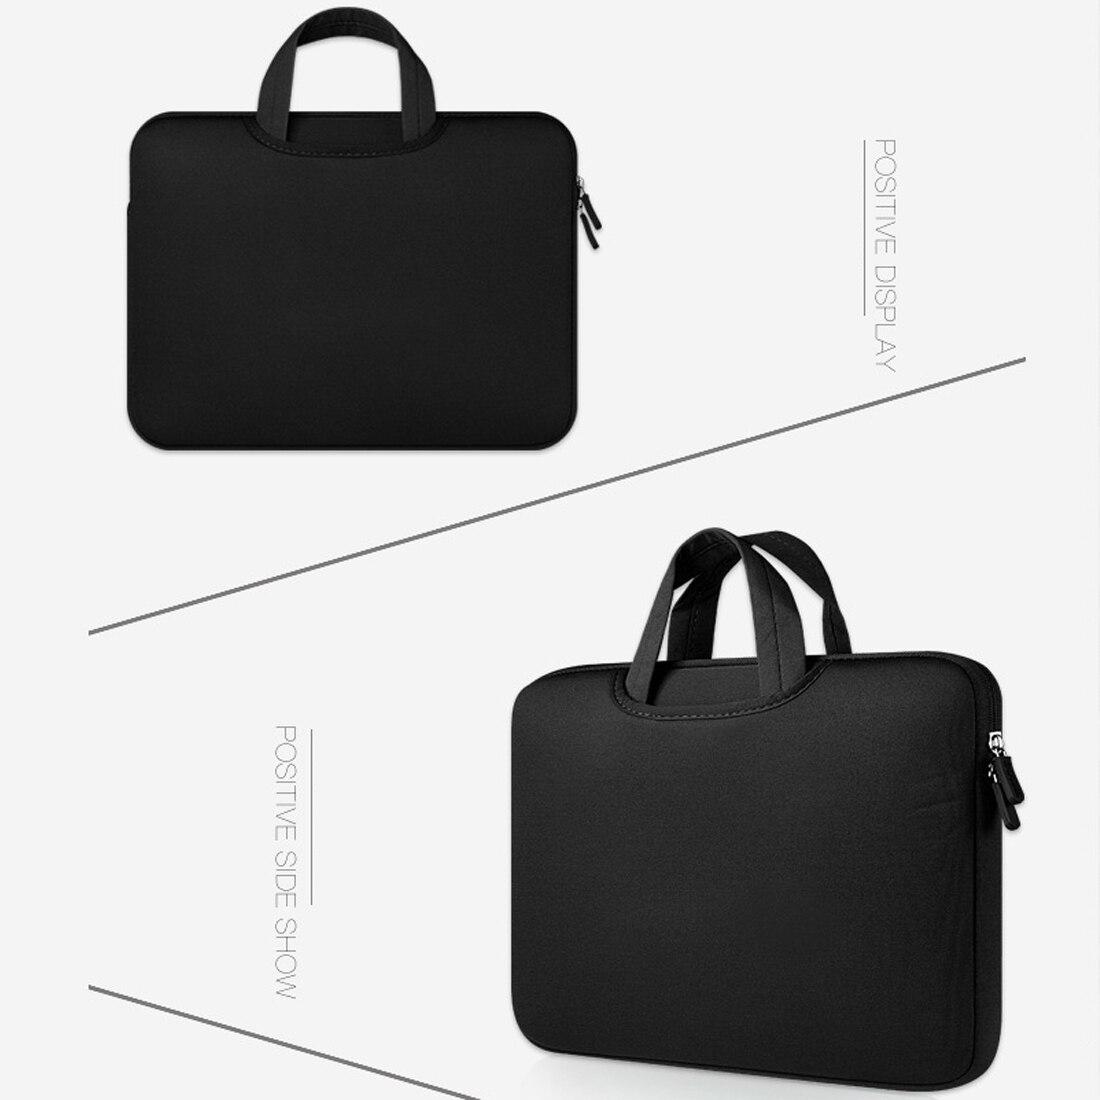 Laptop Sleeve Case 11.6 13.3 15.4 15.6 Inch Notebook Bag 13.3 For MacBook Air Pro 13 Case Laptop Bag 11,13,15 Inch Case